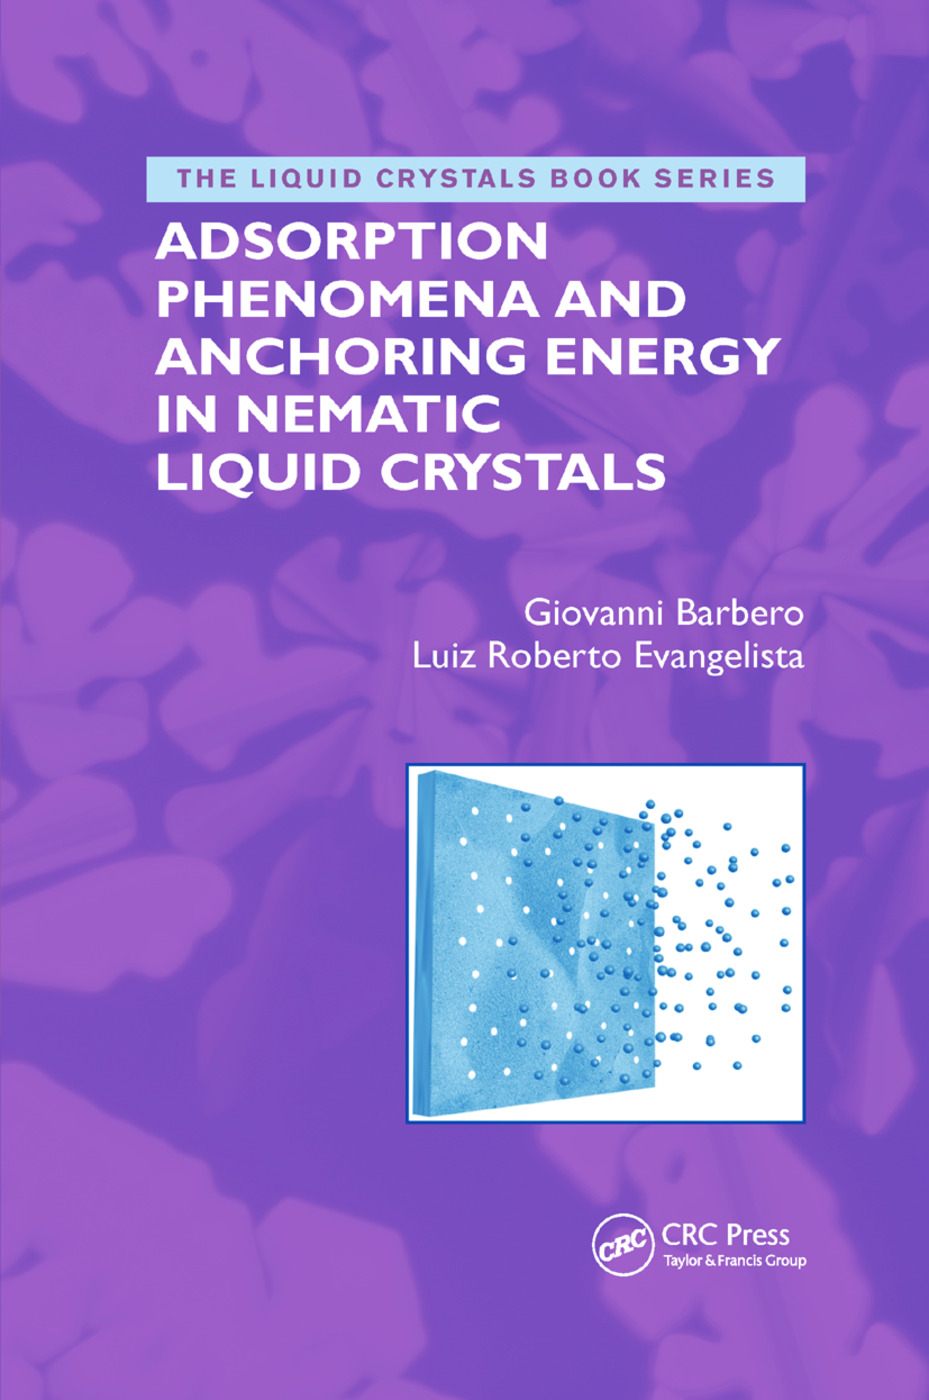 Adsorption Phenomena and Anchoring Energy in Nematic Liquid Crystals